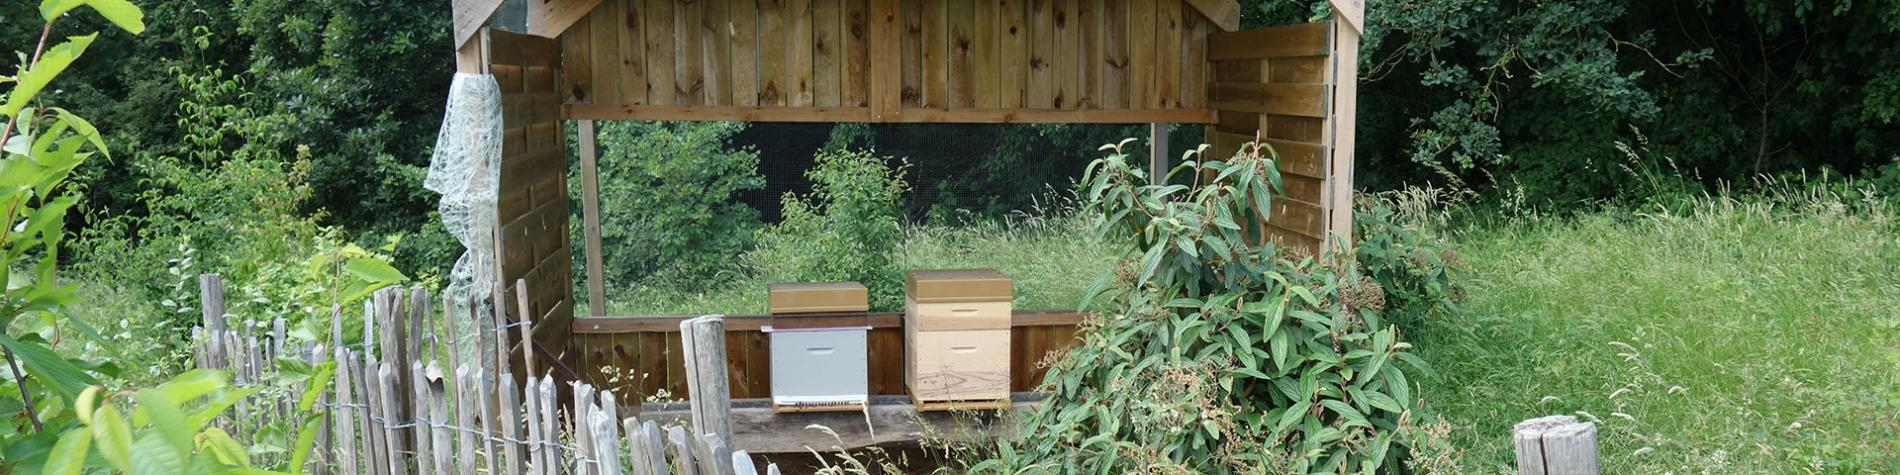 Verger - rucher - didactique - Couillet - Parentville